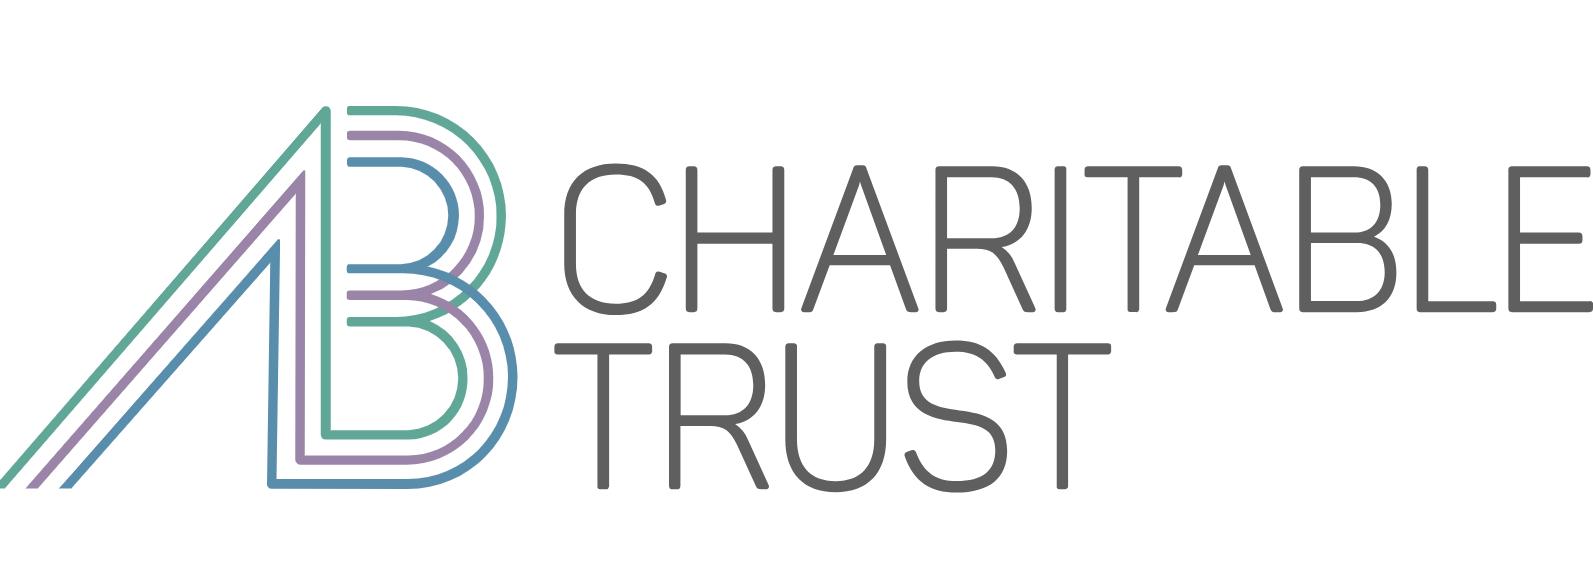 AB Charitable Trust - VODA